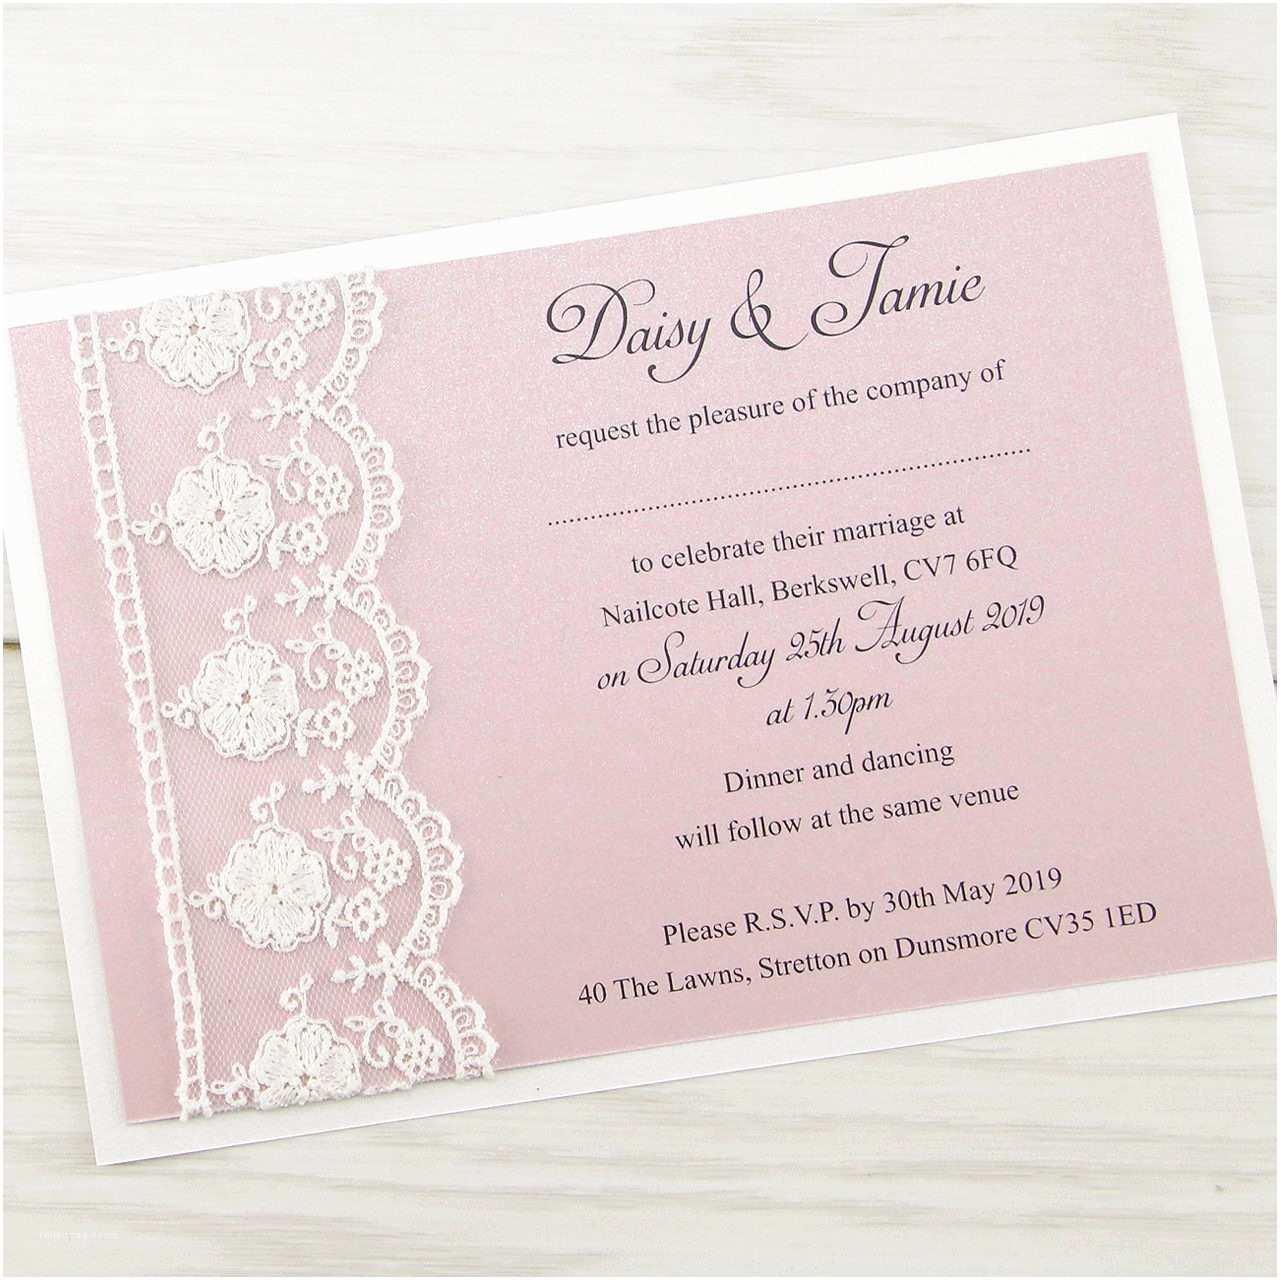 Cheap Destination Wedding Invitations Invitations Inexpensive Wedding Invitations for Fancy